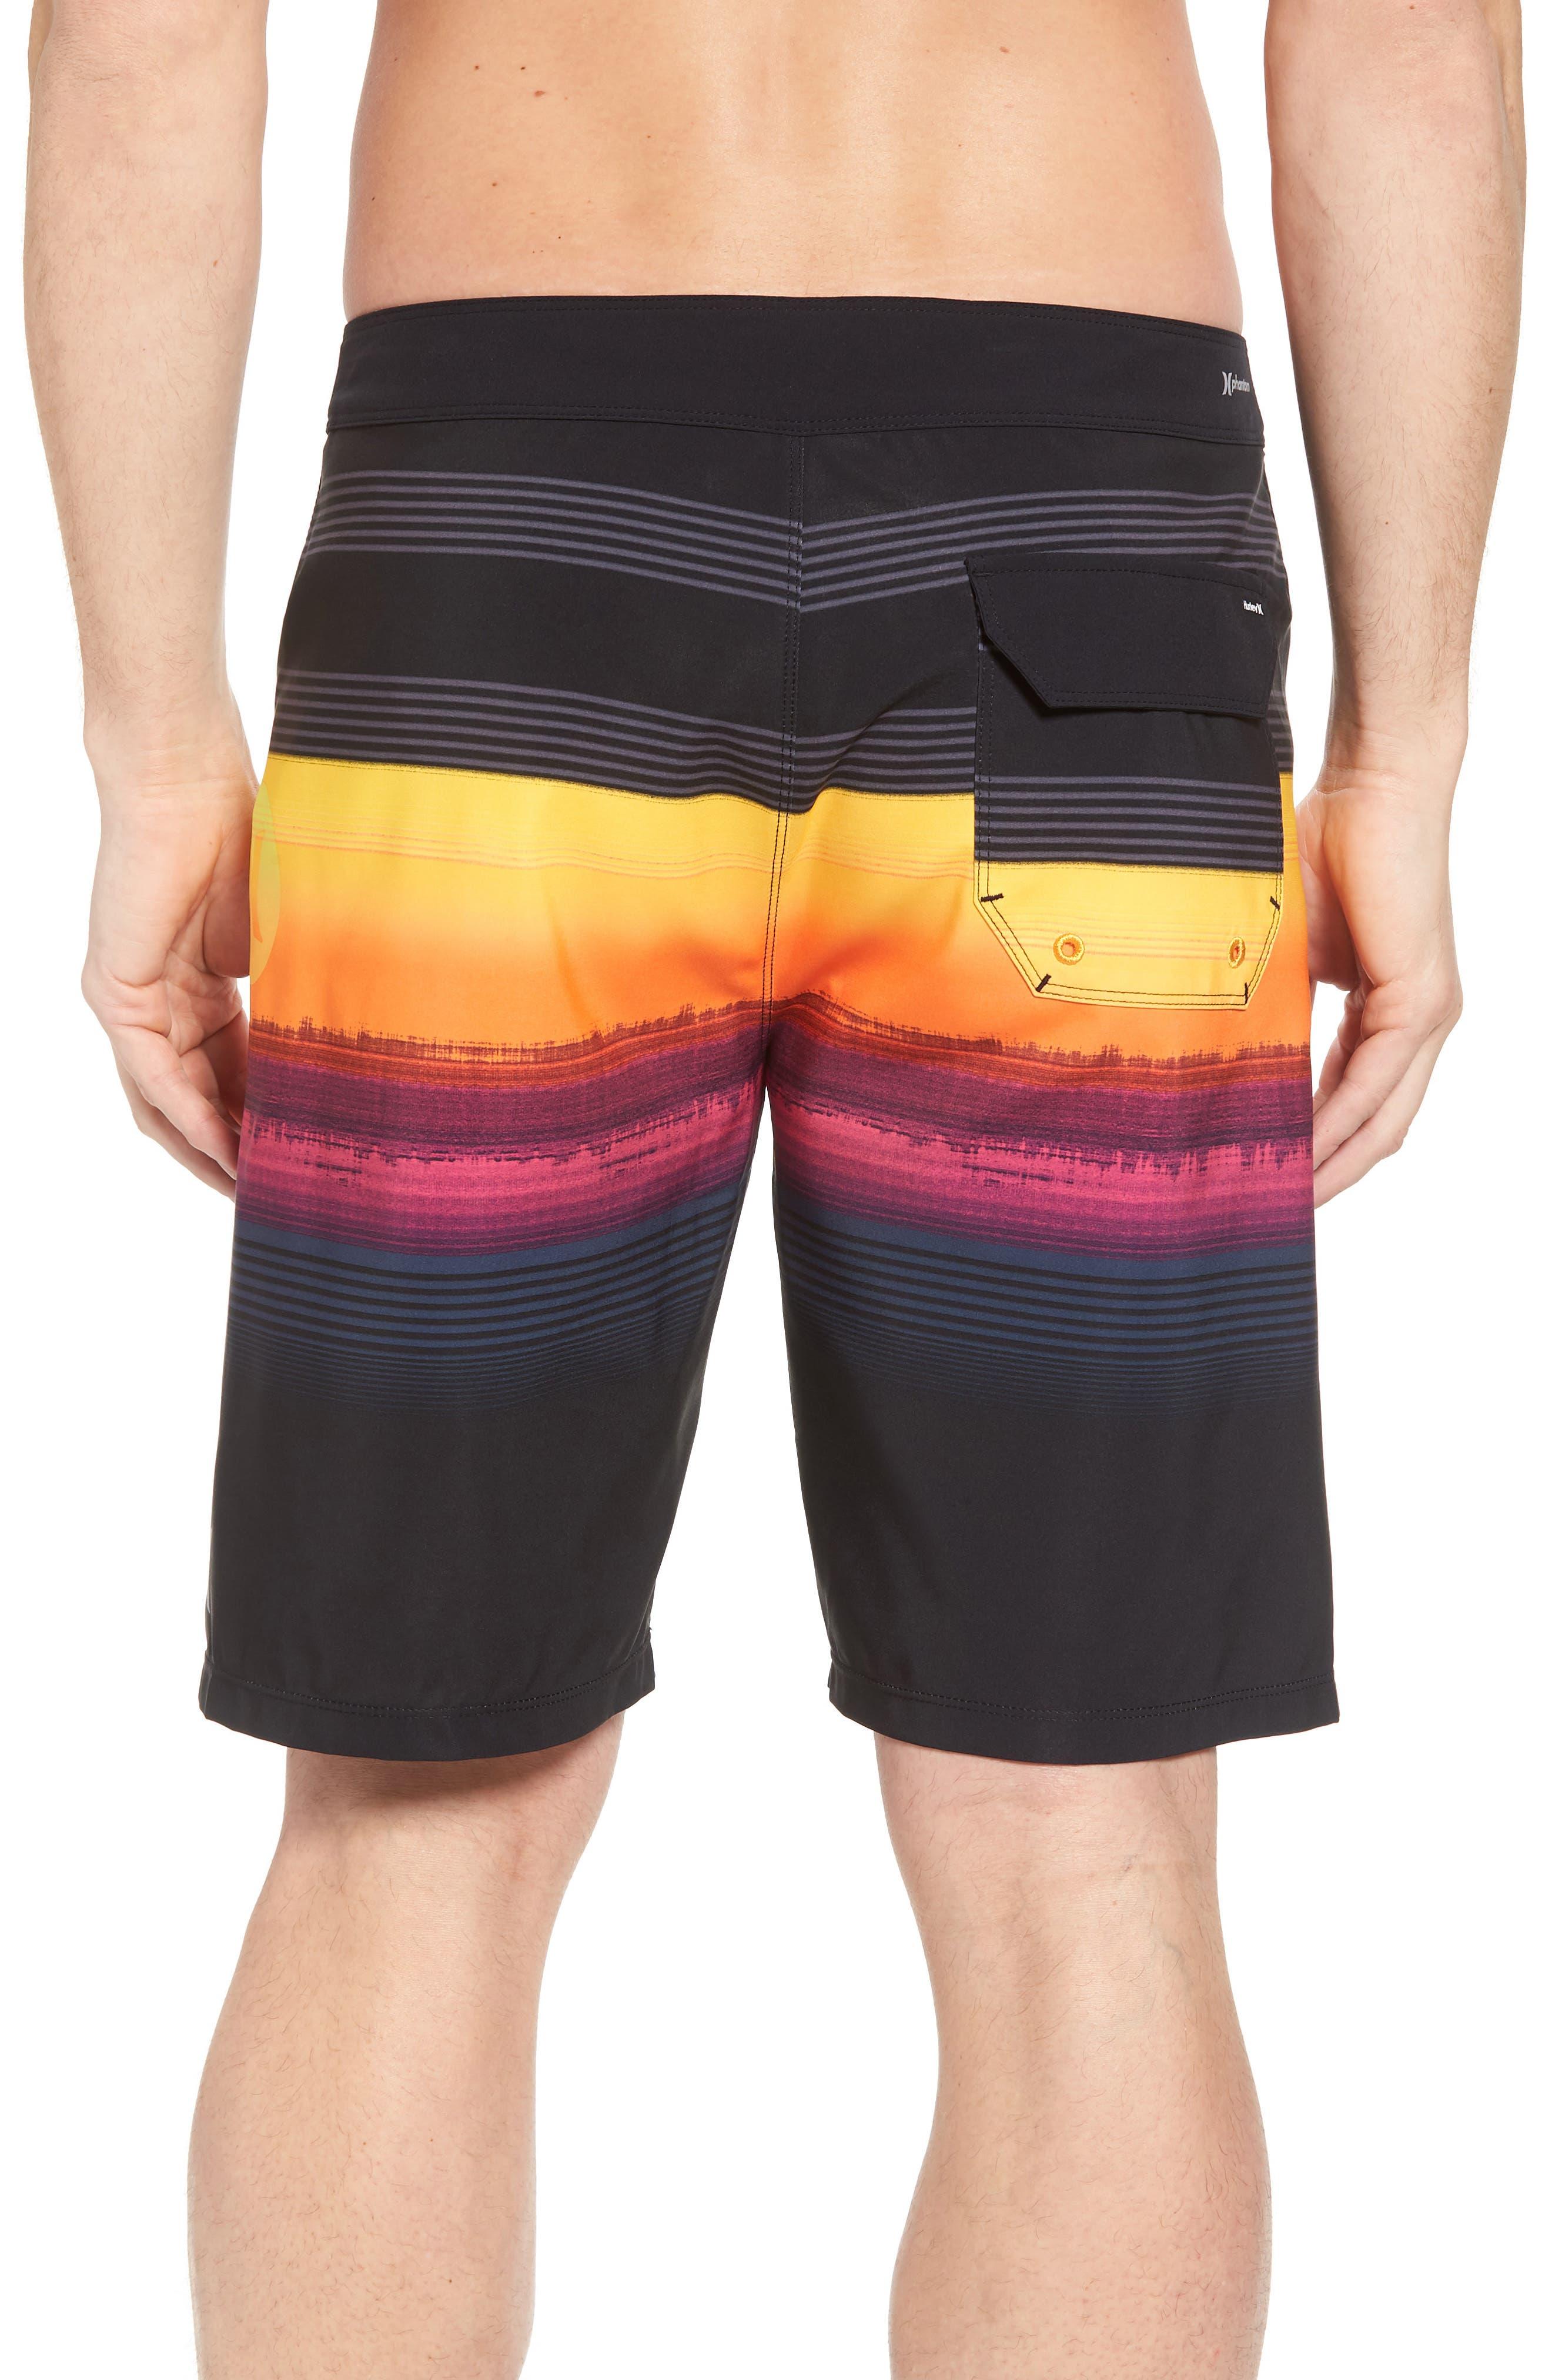 Phantom Gaviota Board Shorts,                             Alternate thumbnail 2, color,                             010